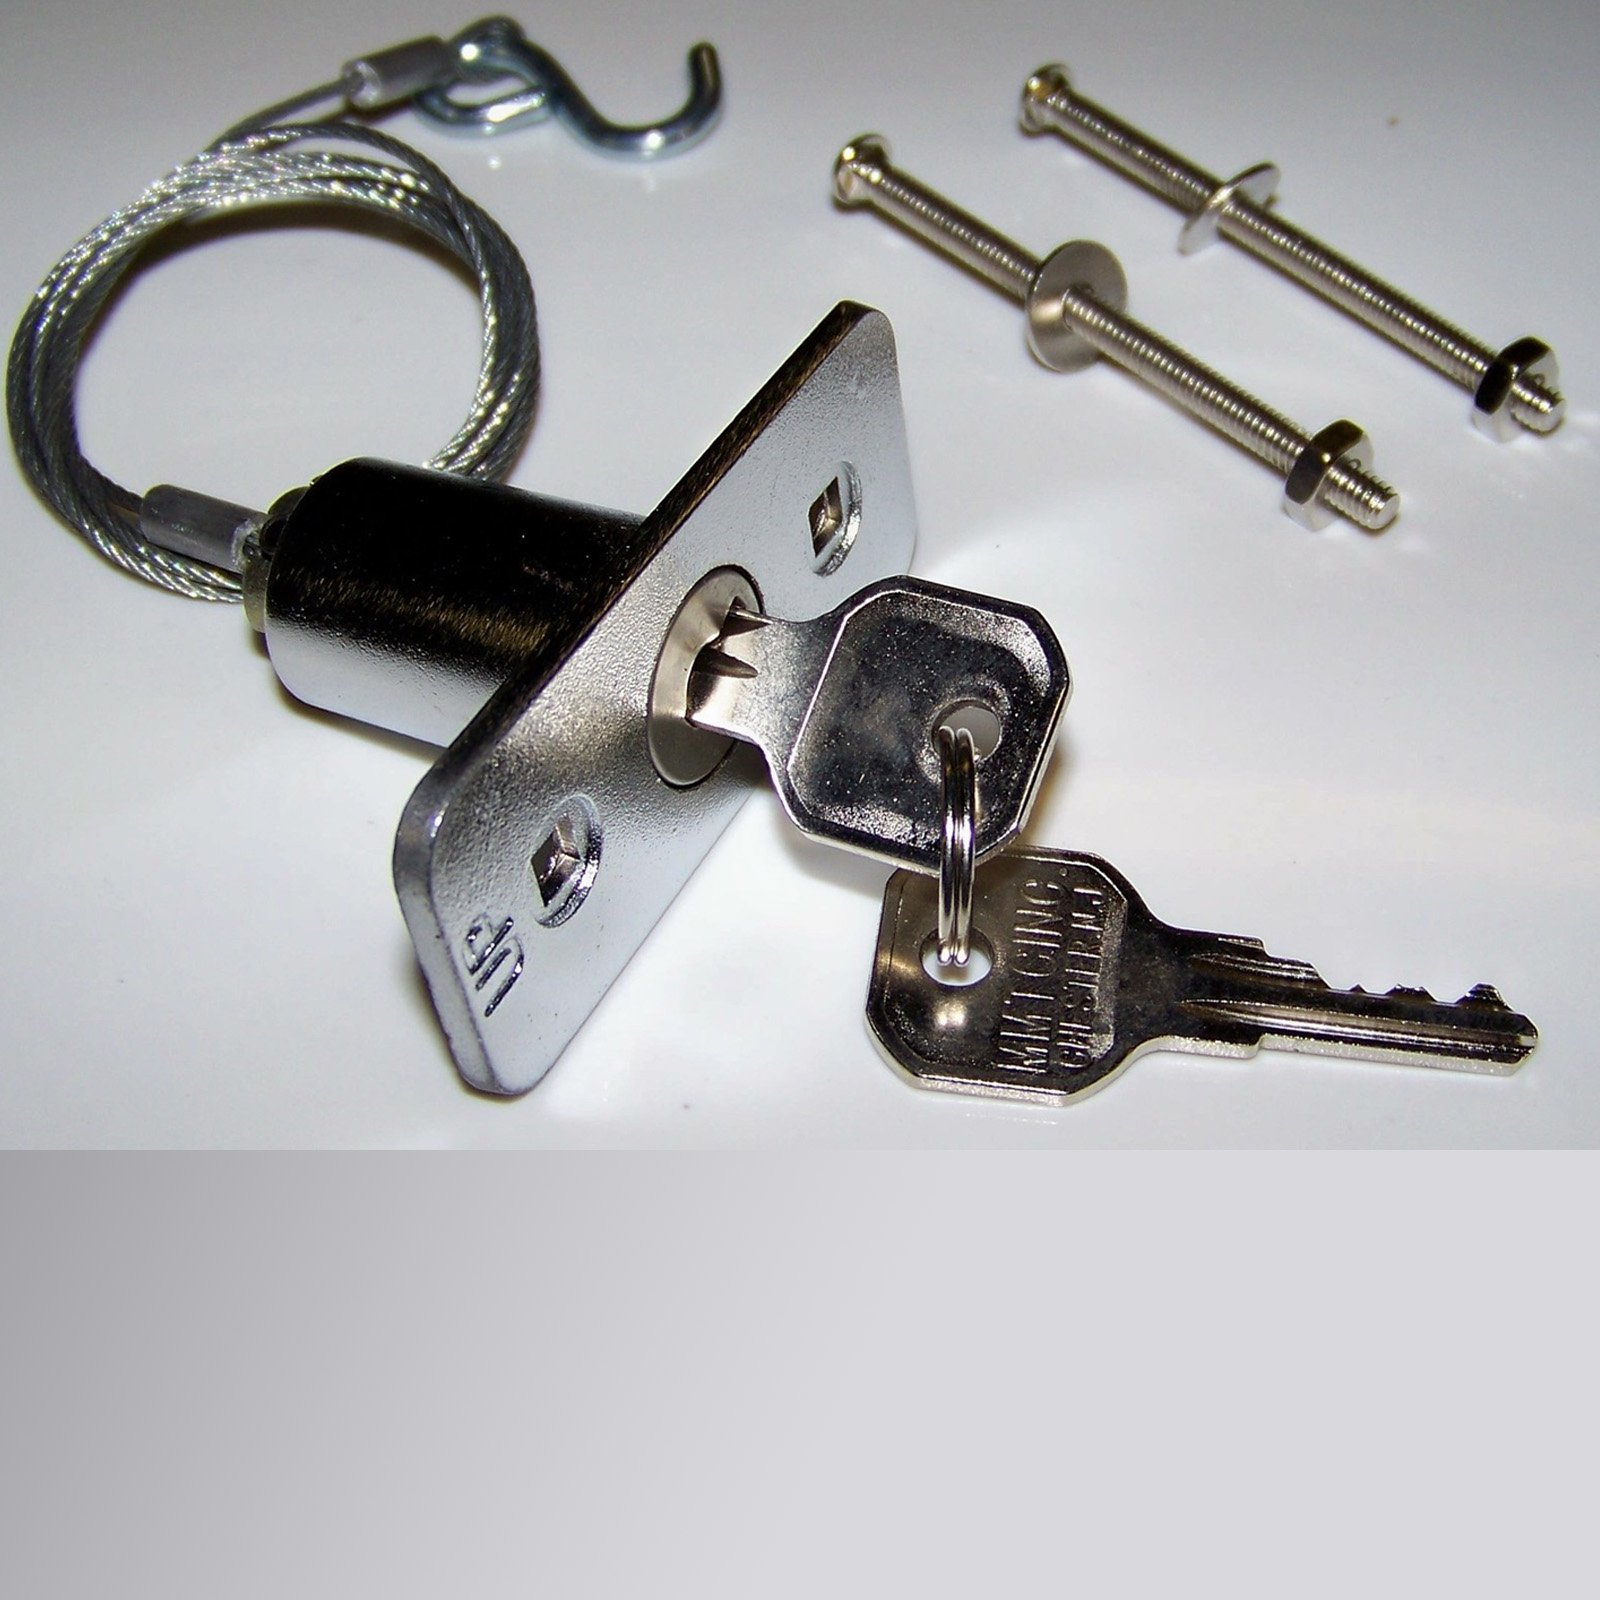 Garage Door Emergency Disconnect Release Key Lock 3 Foot Cable